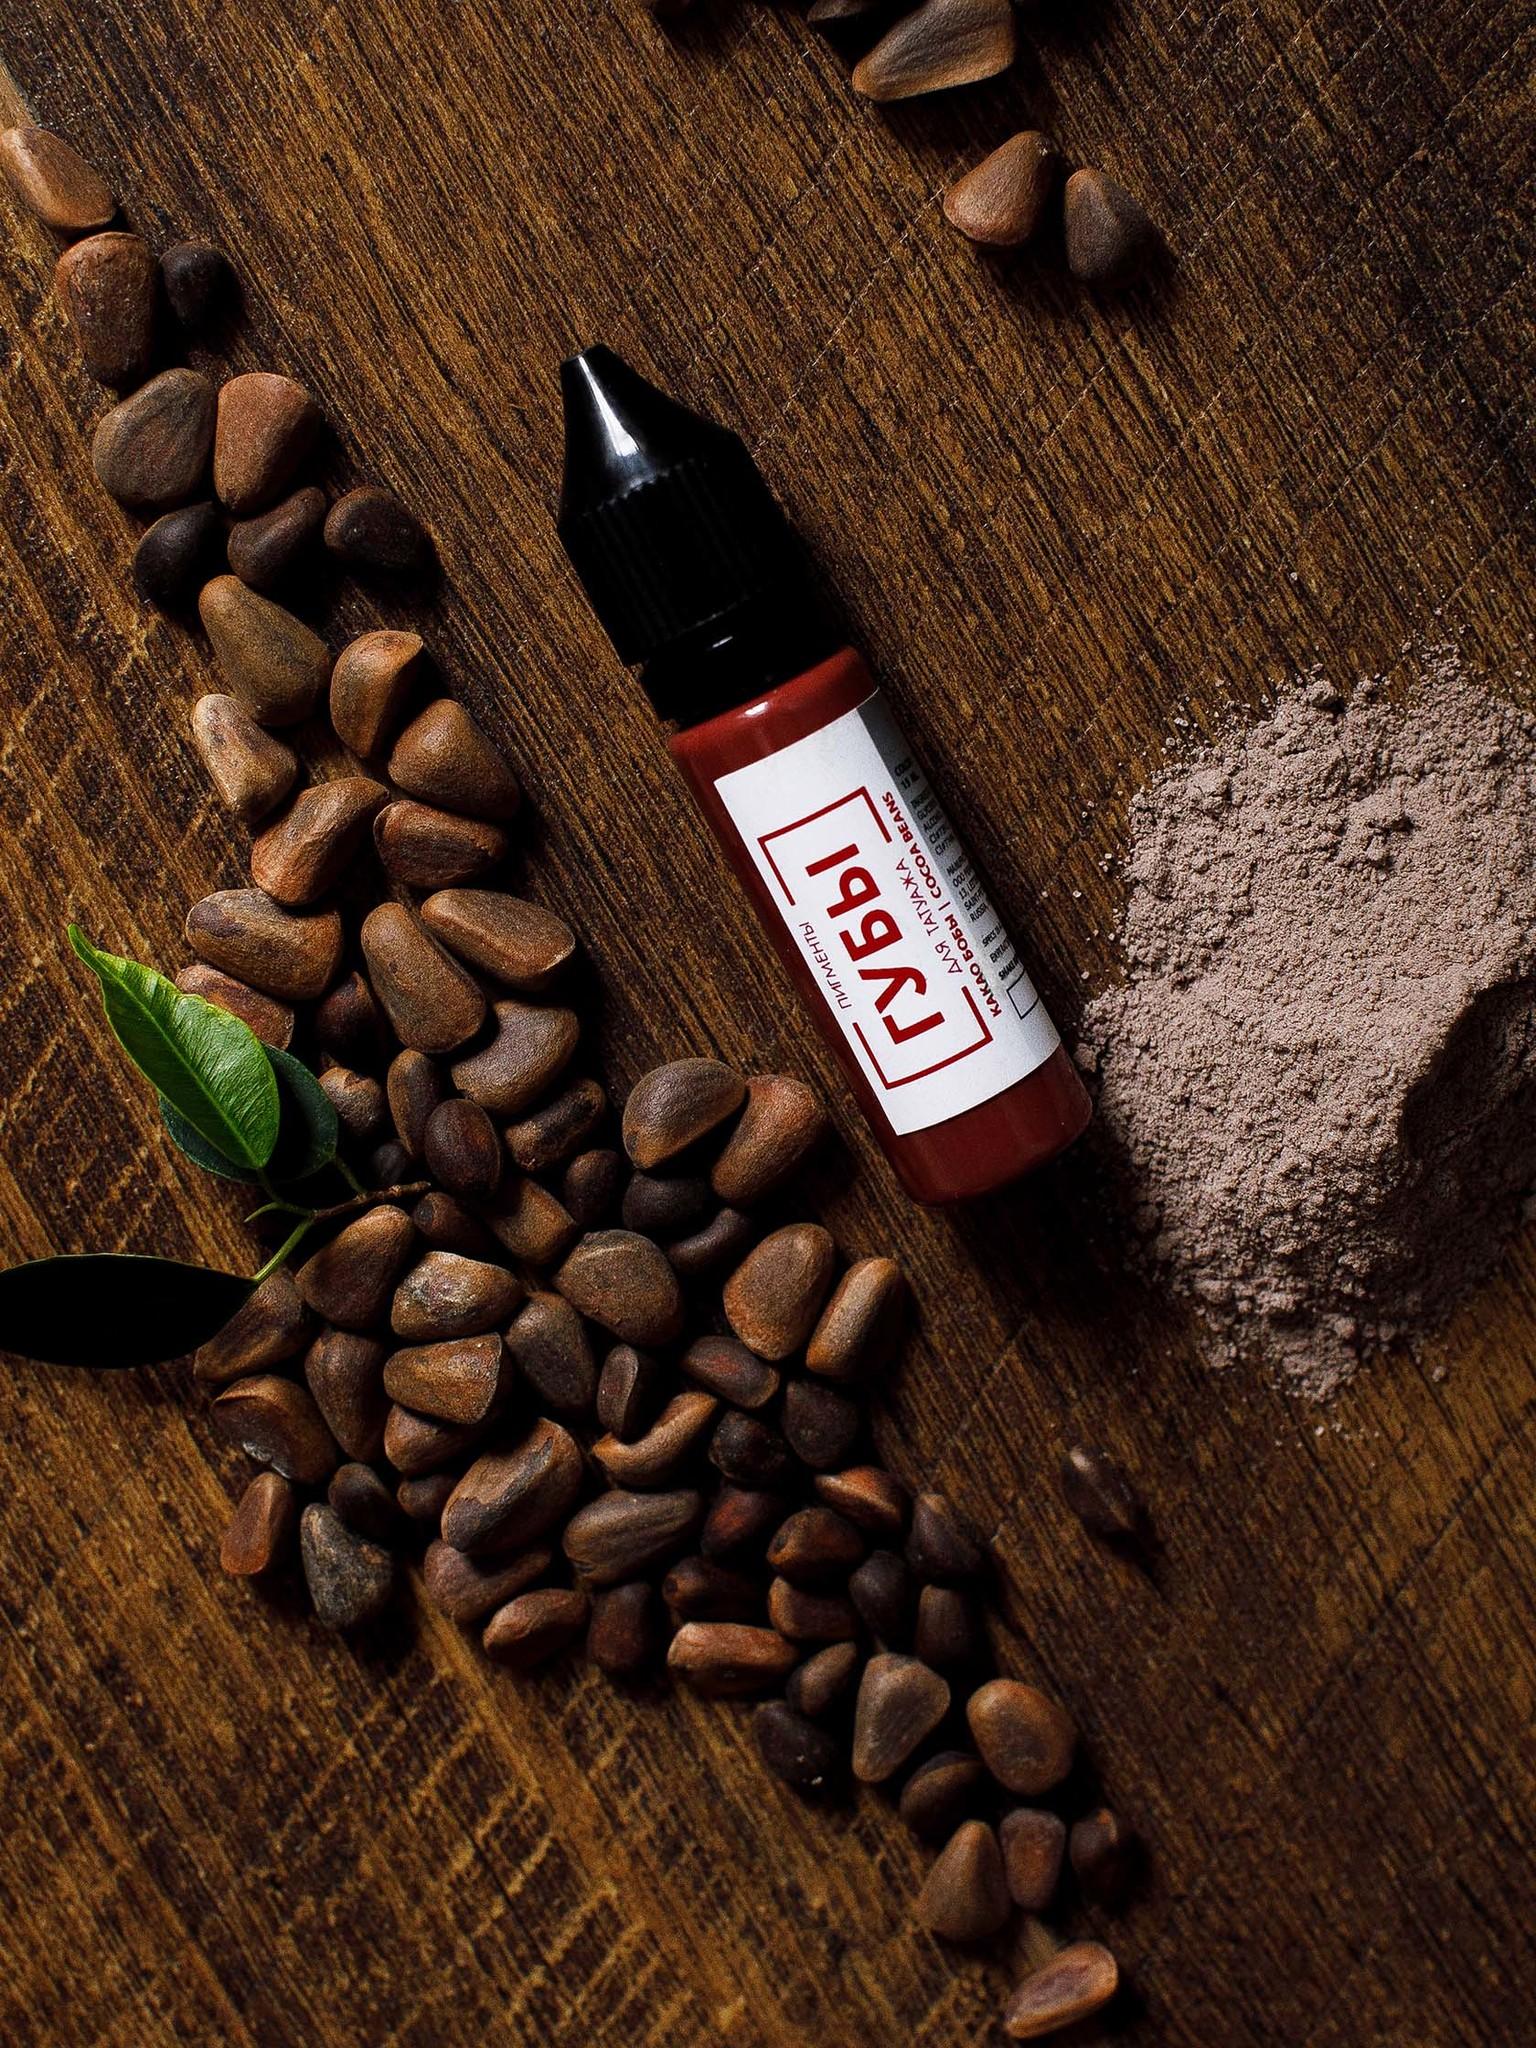 Пигмент для татуажа губ Какао бобы от Брови PMU